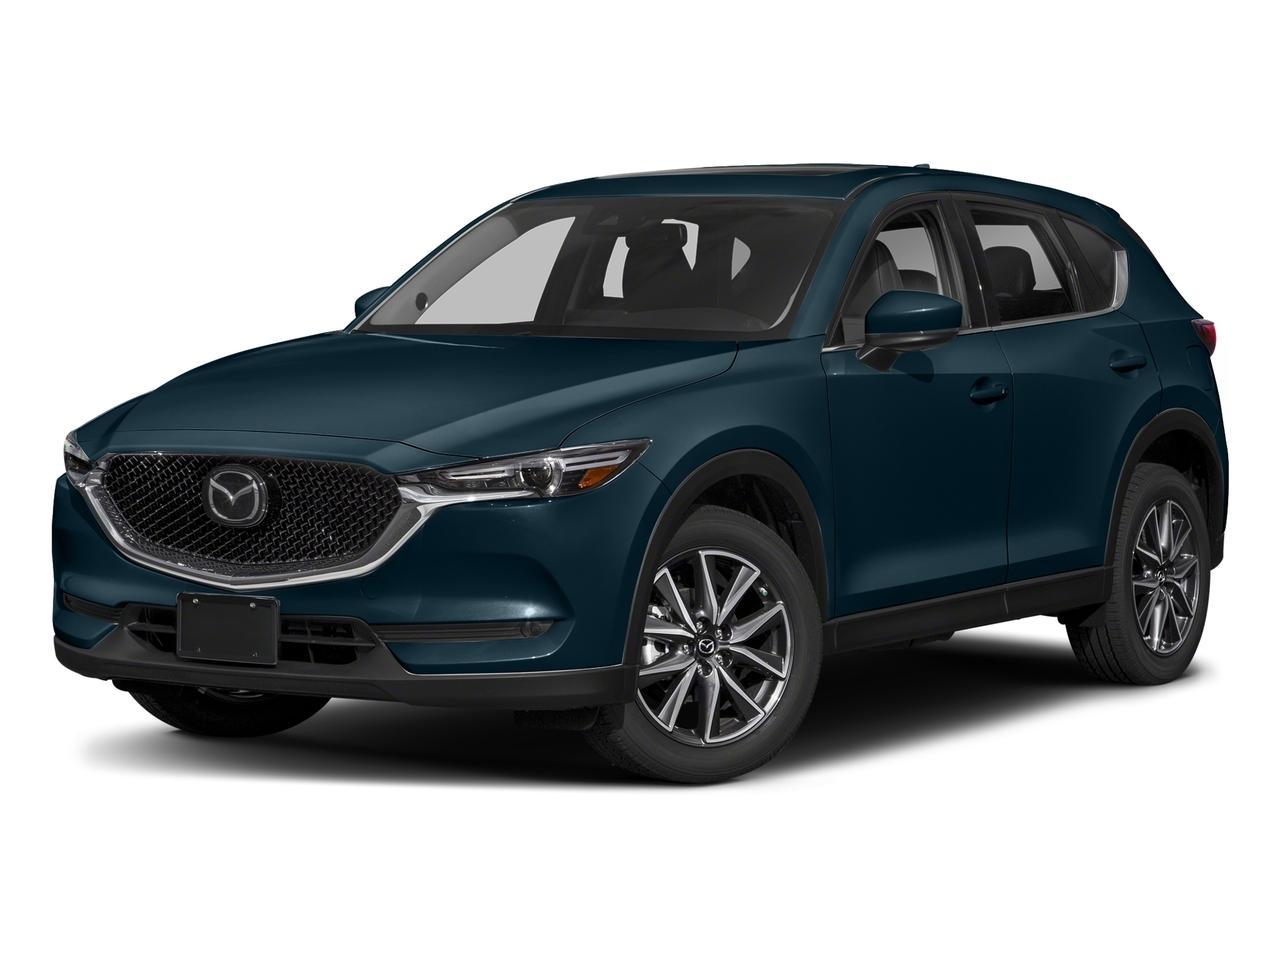 2018 Mazda CX-5 Vehicle Photo in Joliet, IL 60586